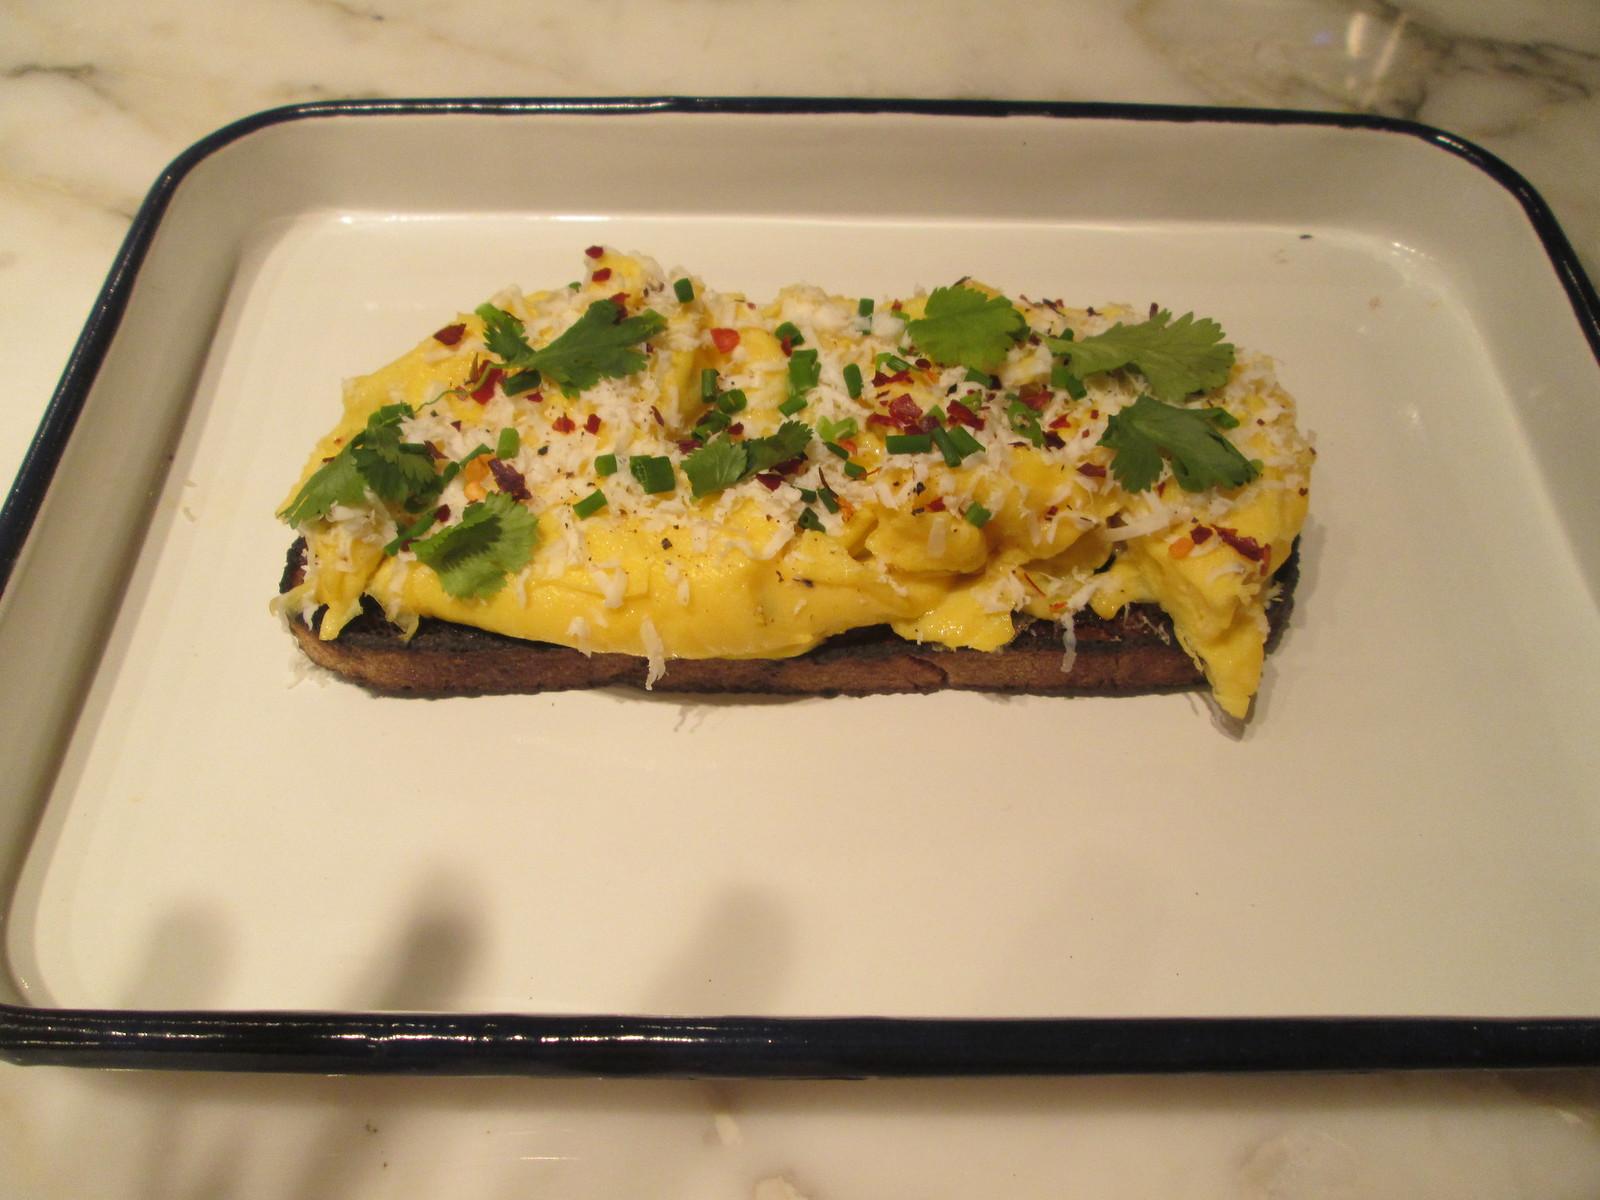 Scrambled eggs on Sourdough